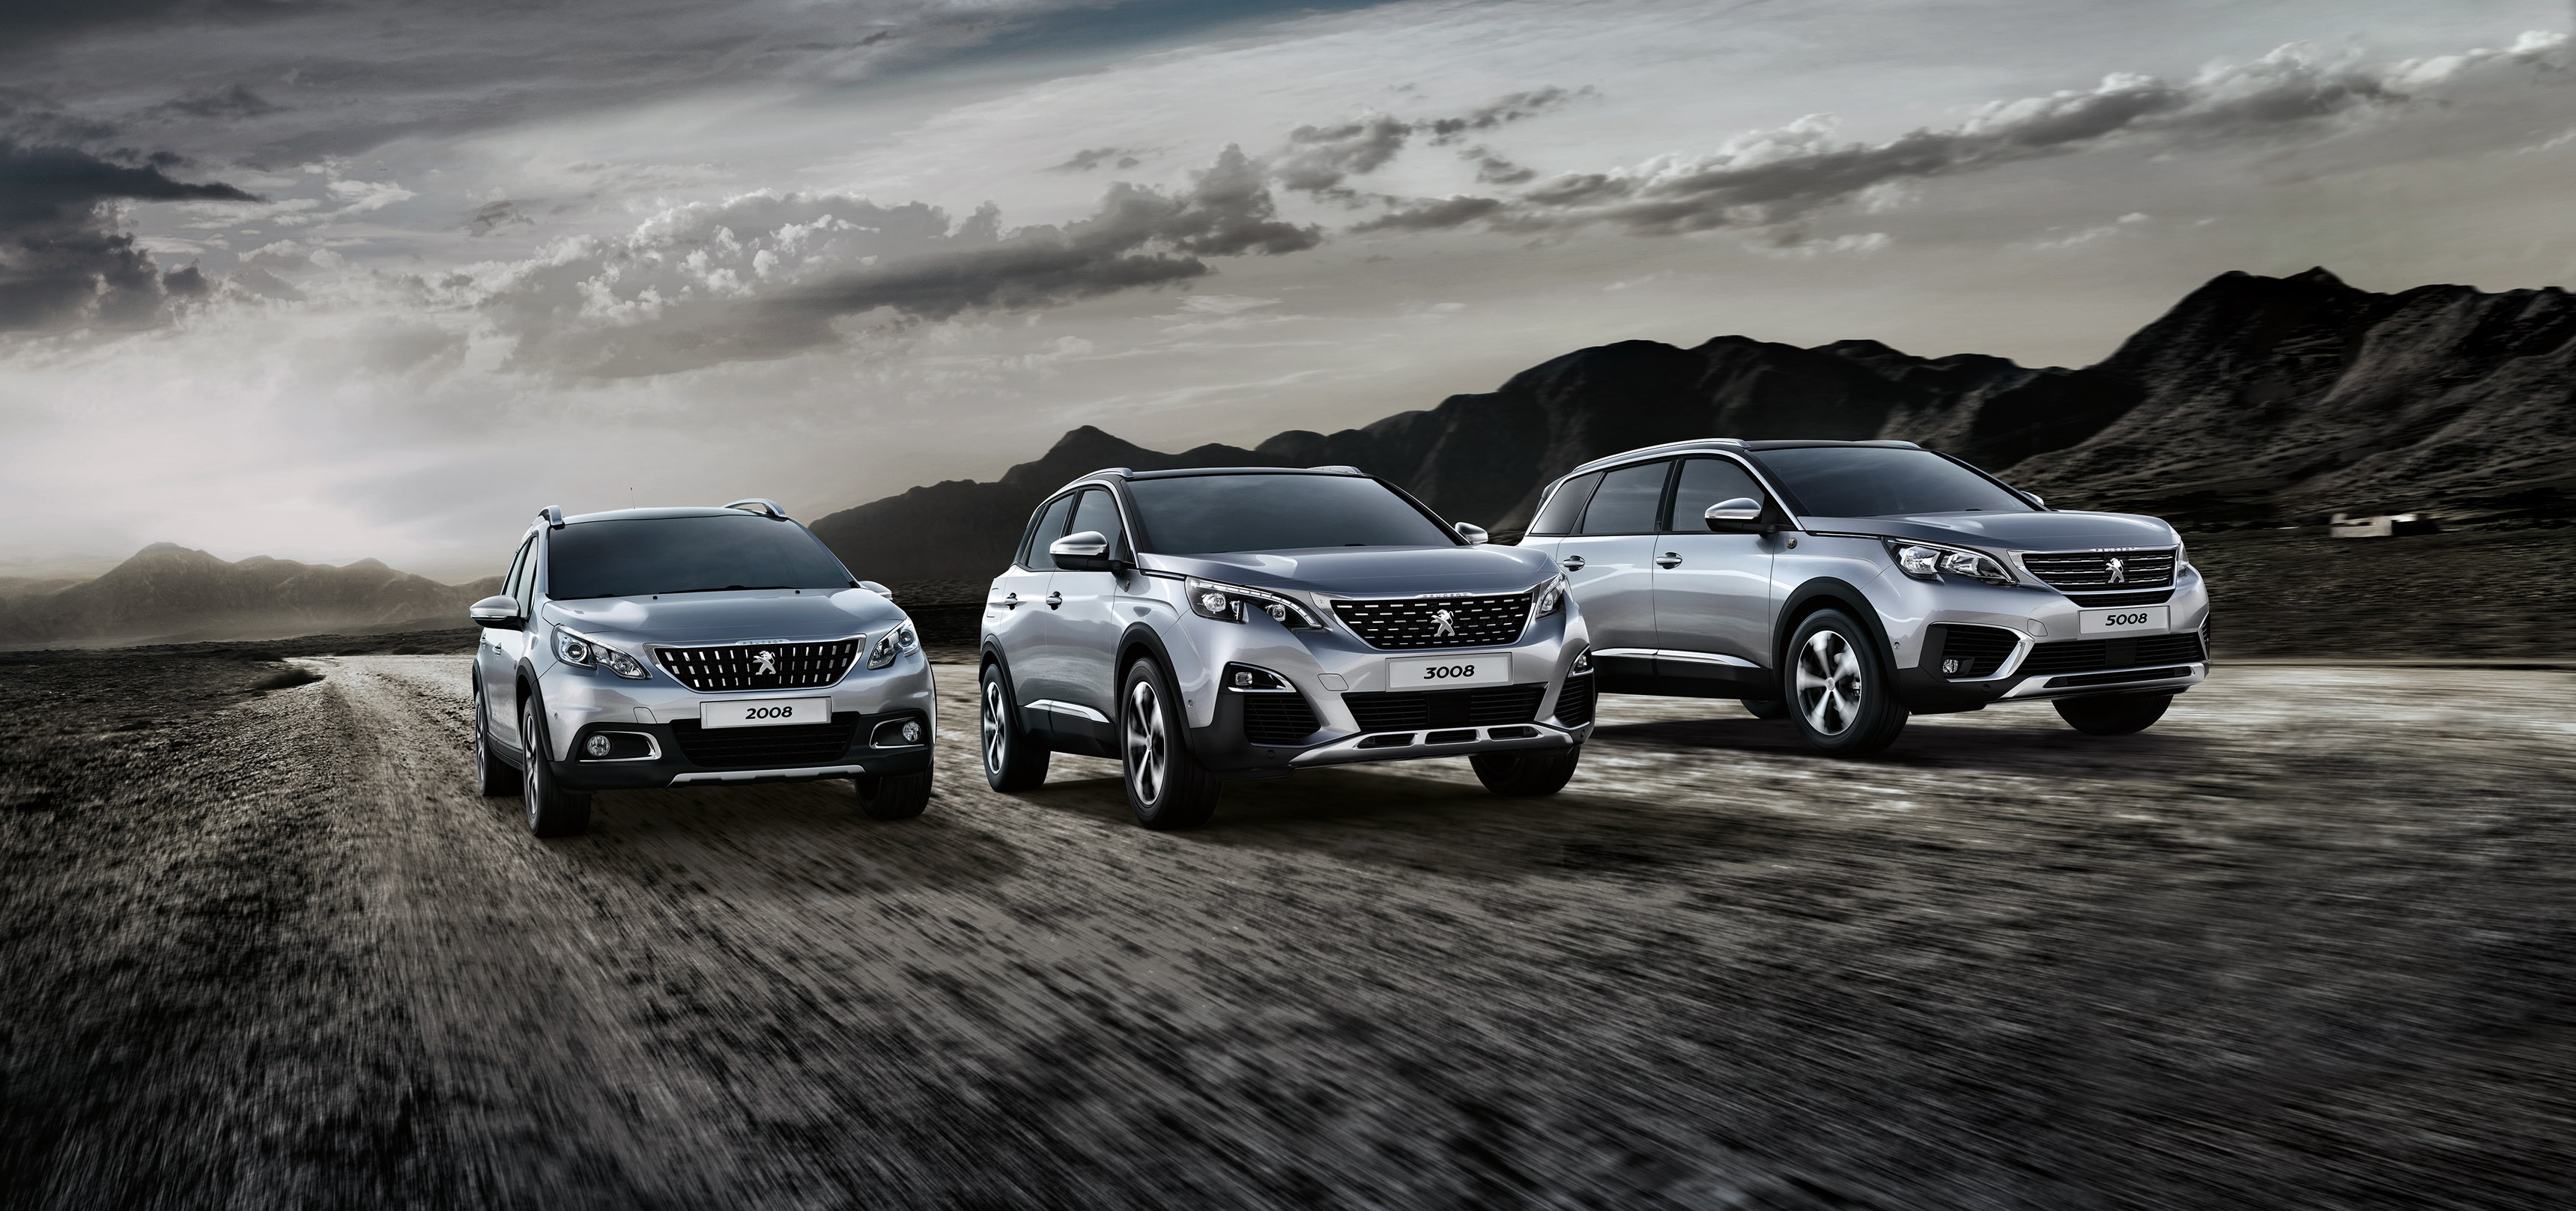 Peugeot lidera segmento SUV em Portugal